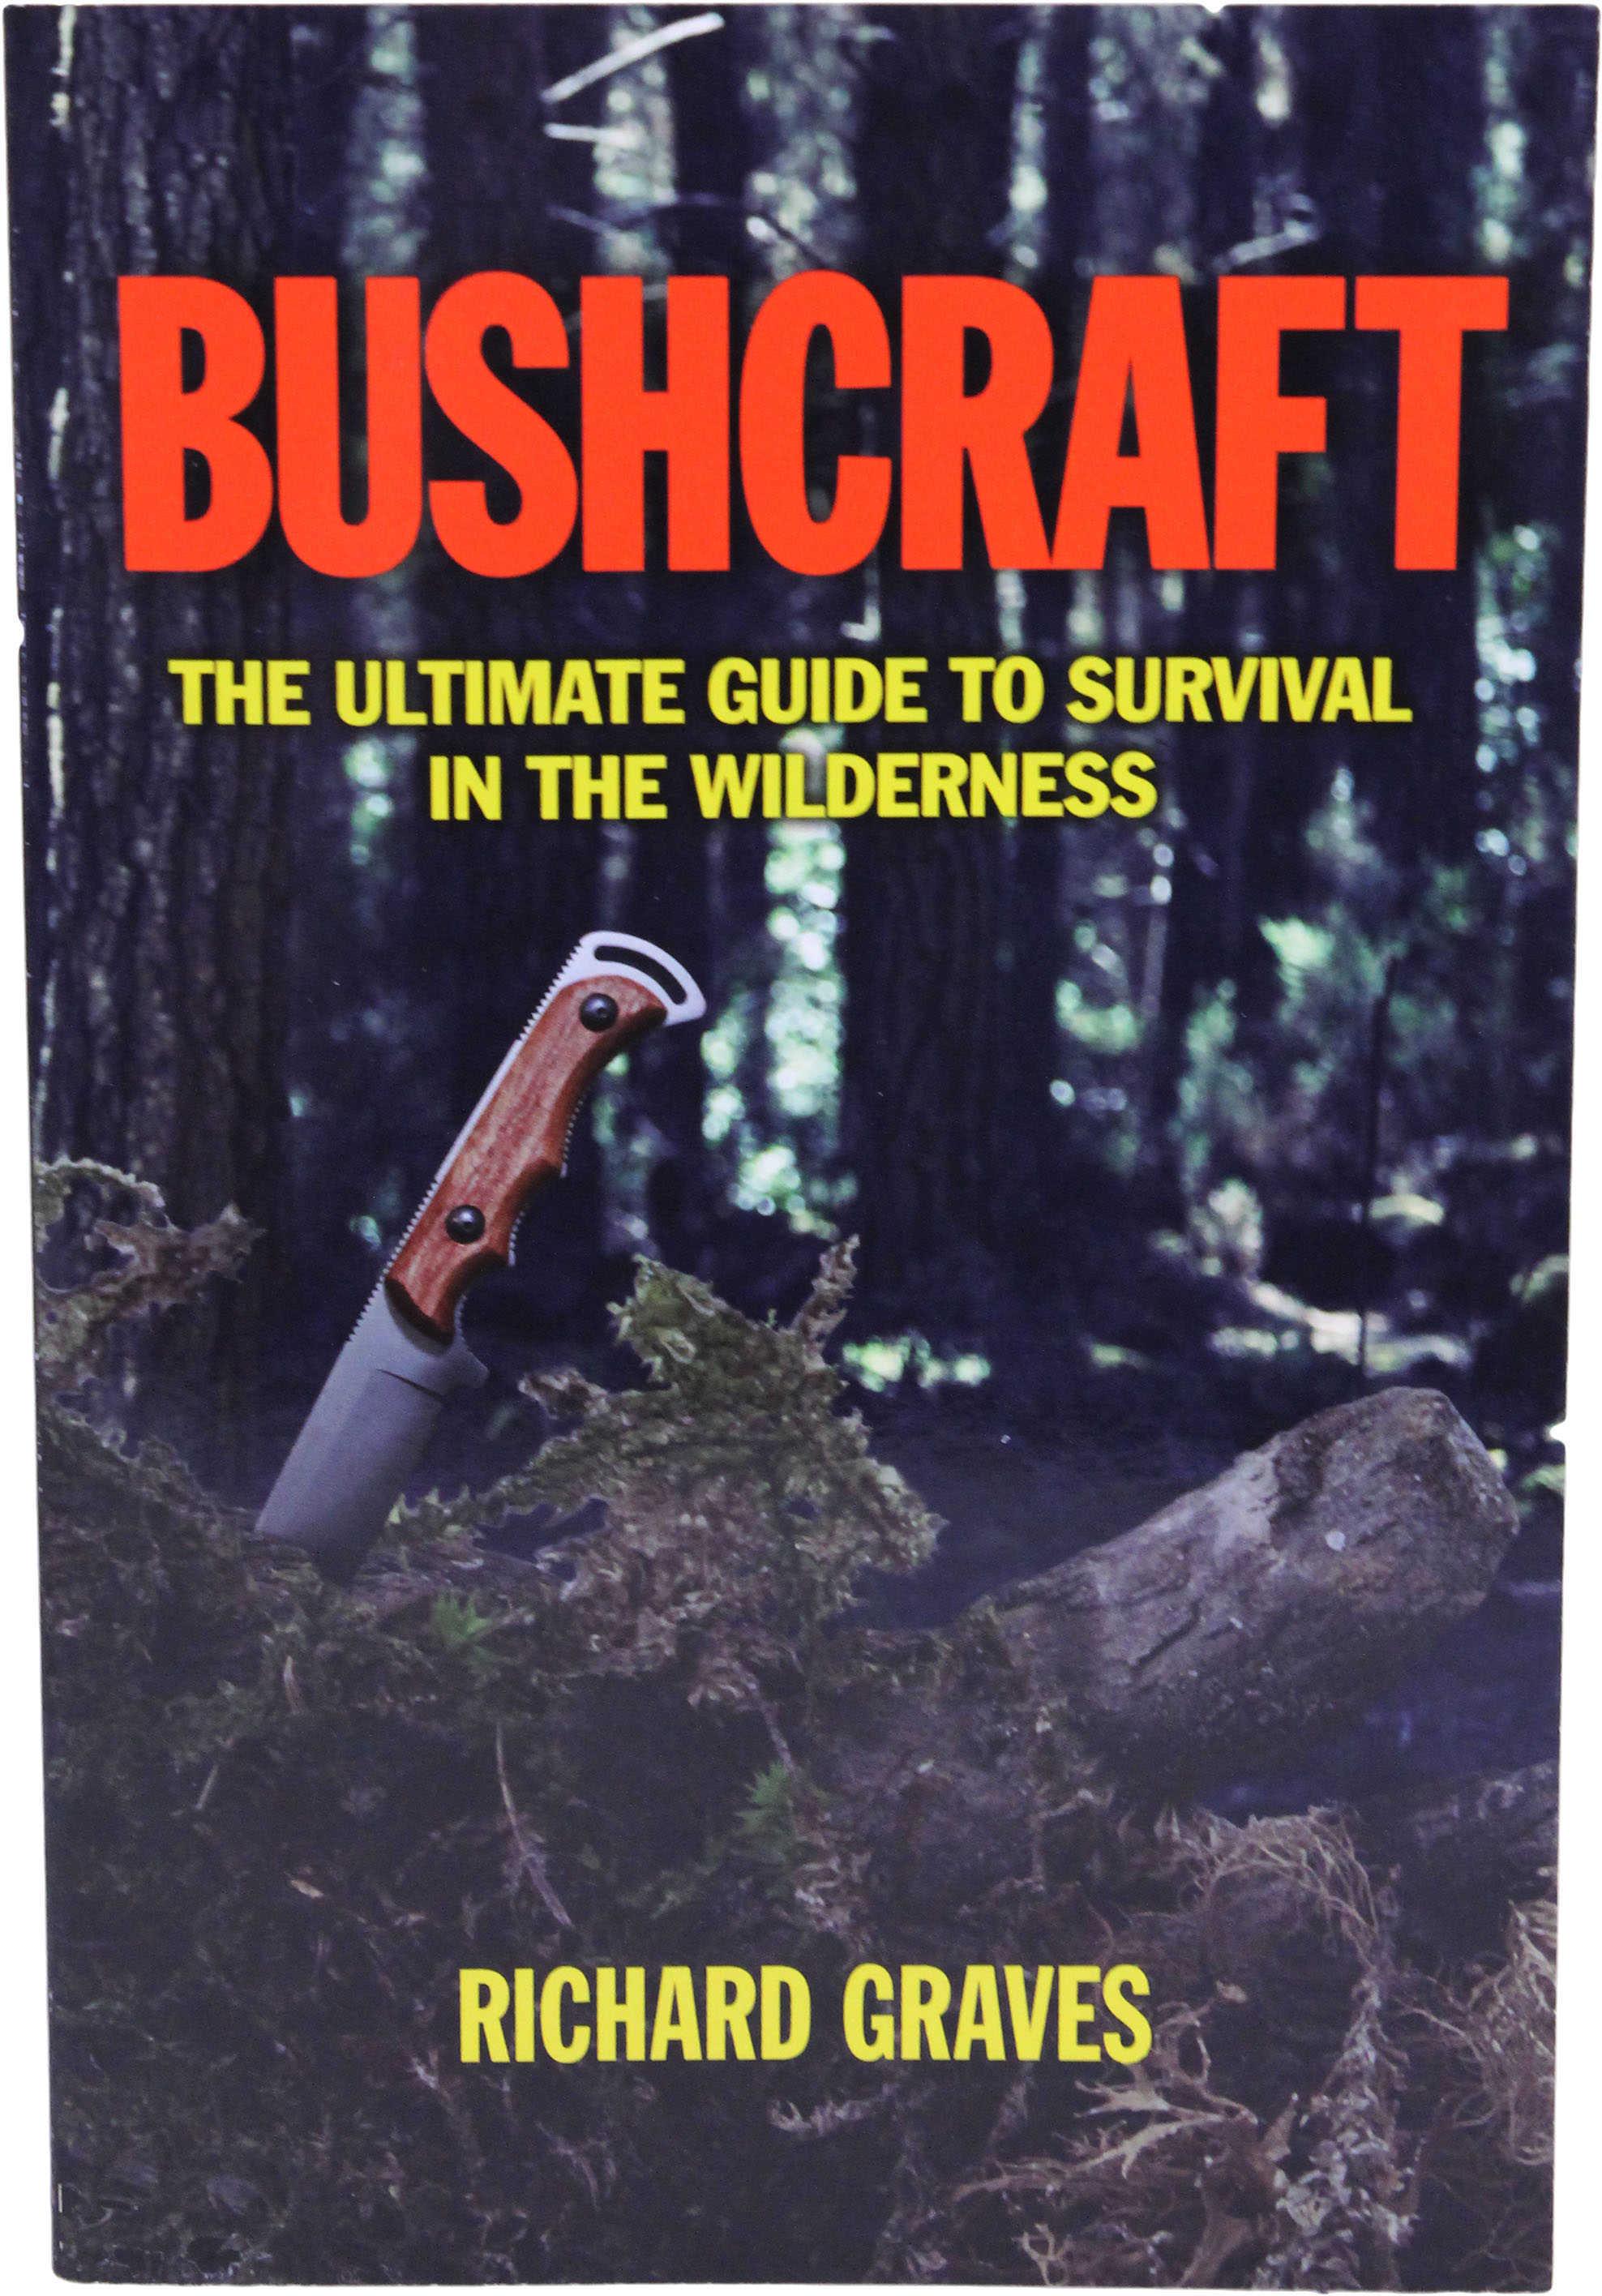 Proforce Equipment Books Bushcraft Md: 44630